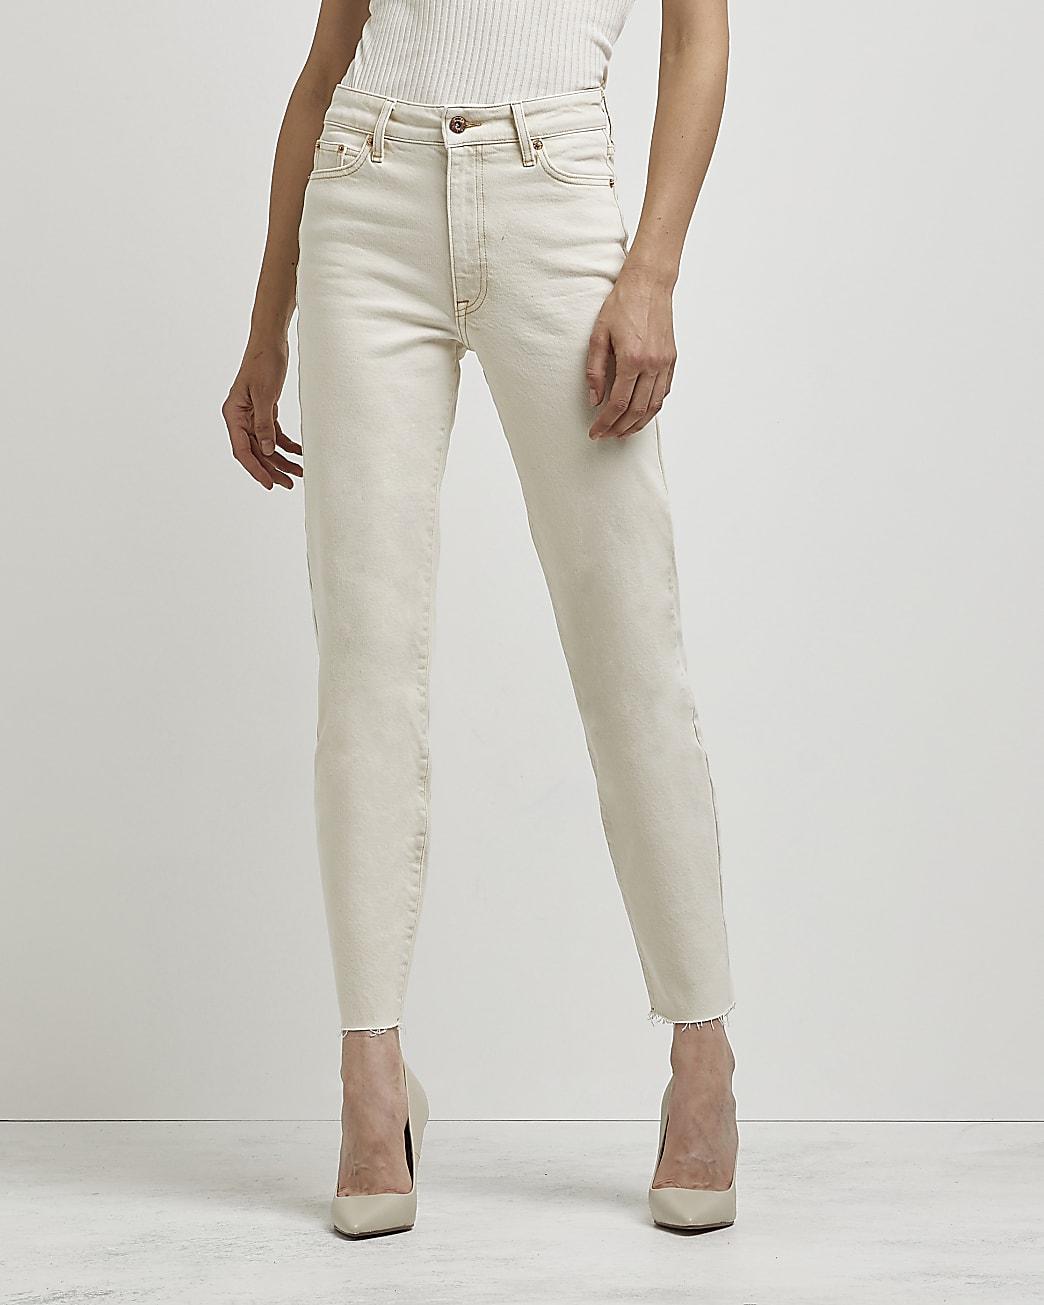 Ecru high waisted straight leg jeans